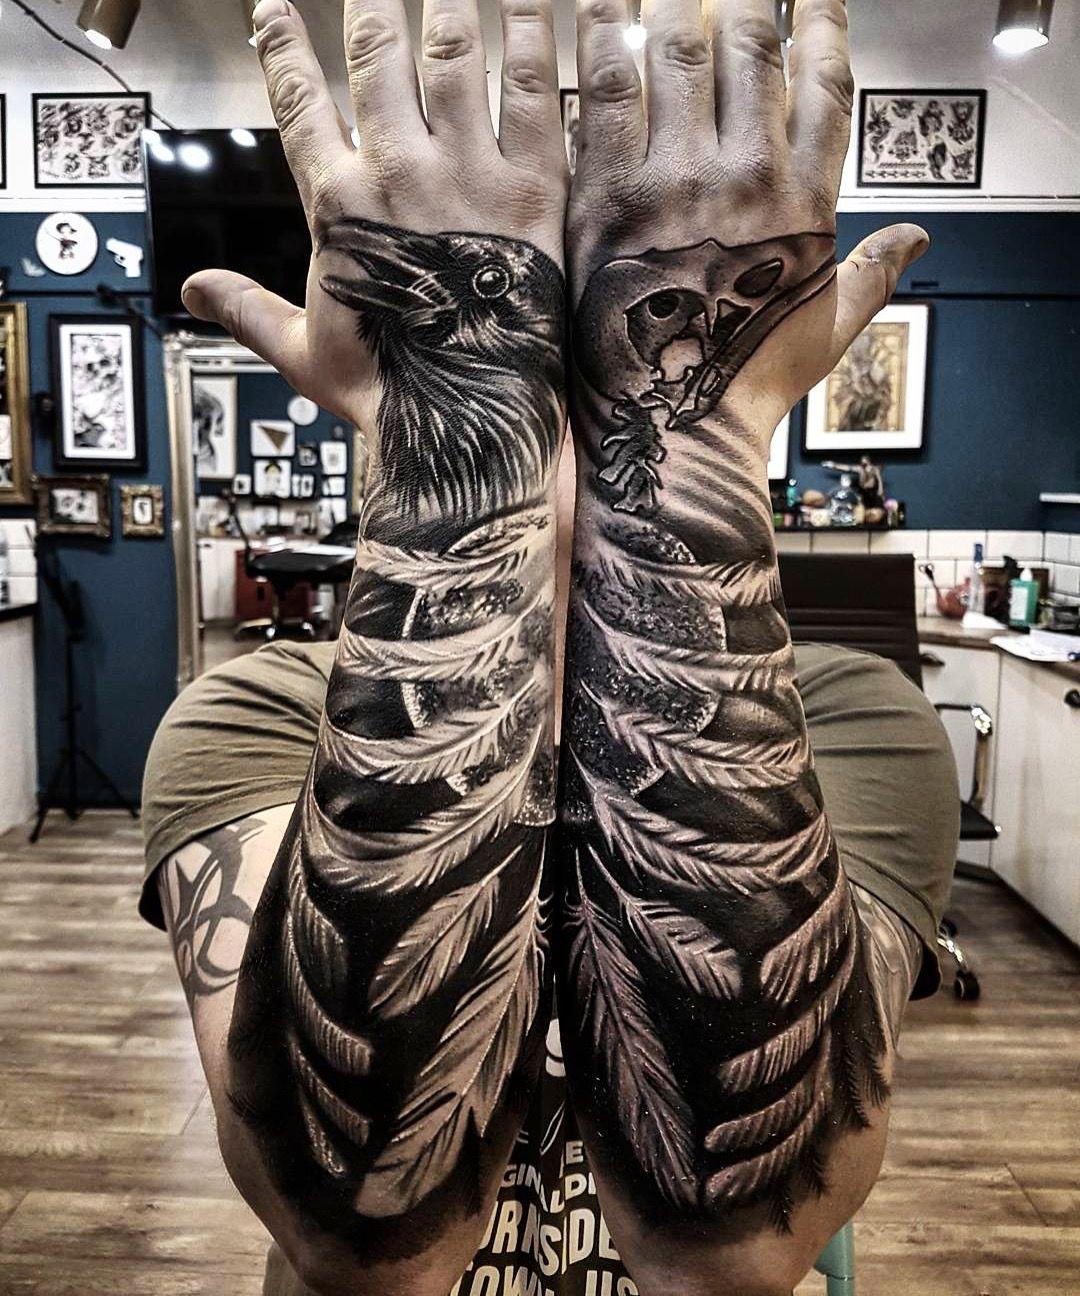 tattoo corvo vida e morte tatuagens pinterest corvos morte e tatuagens. Black Bedroom Furniture Sets. Home Design Ideas